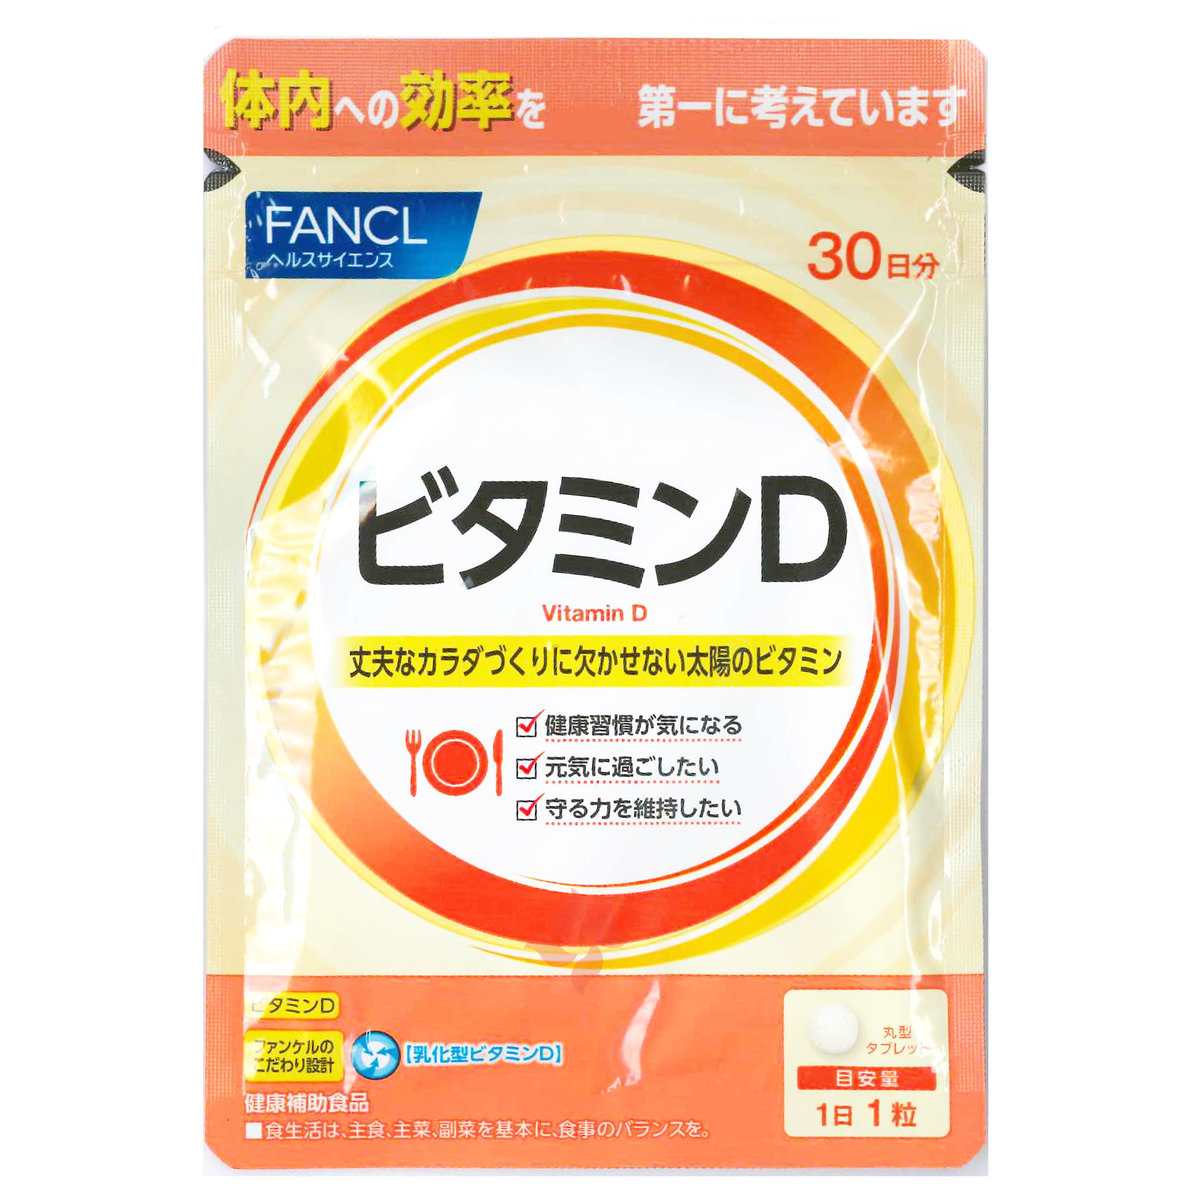 Natural Vitamin D 30 days (30Grains) (4908049491925)